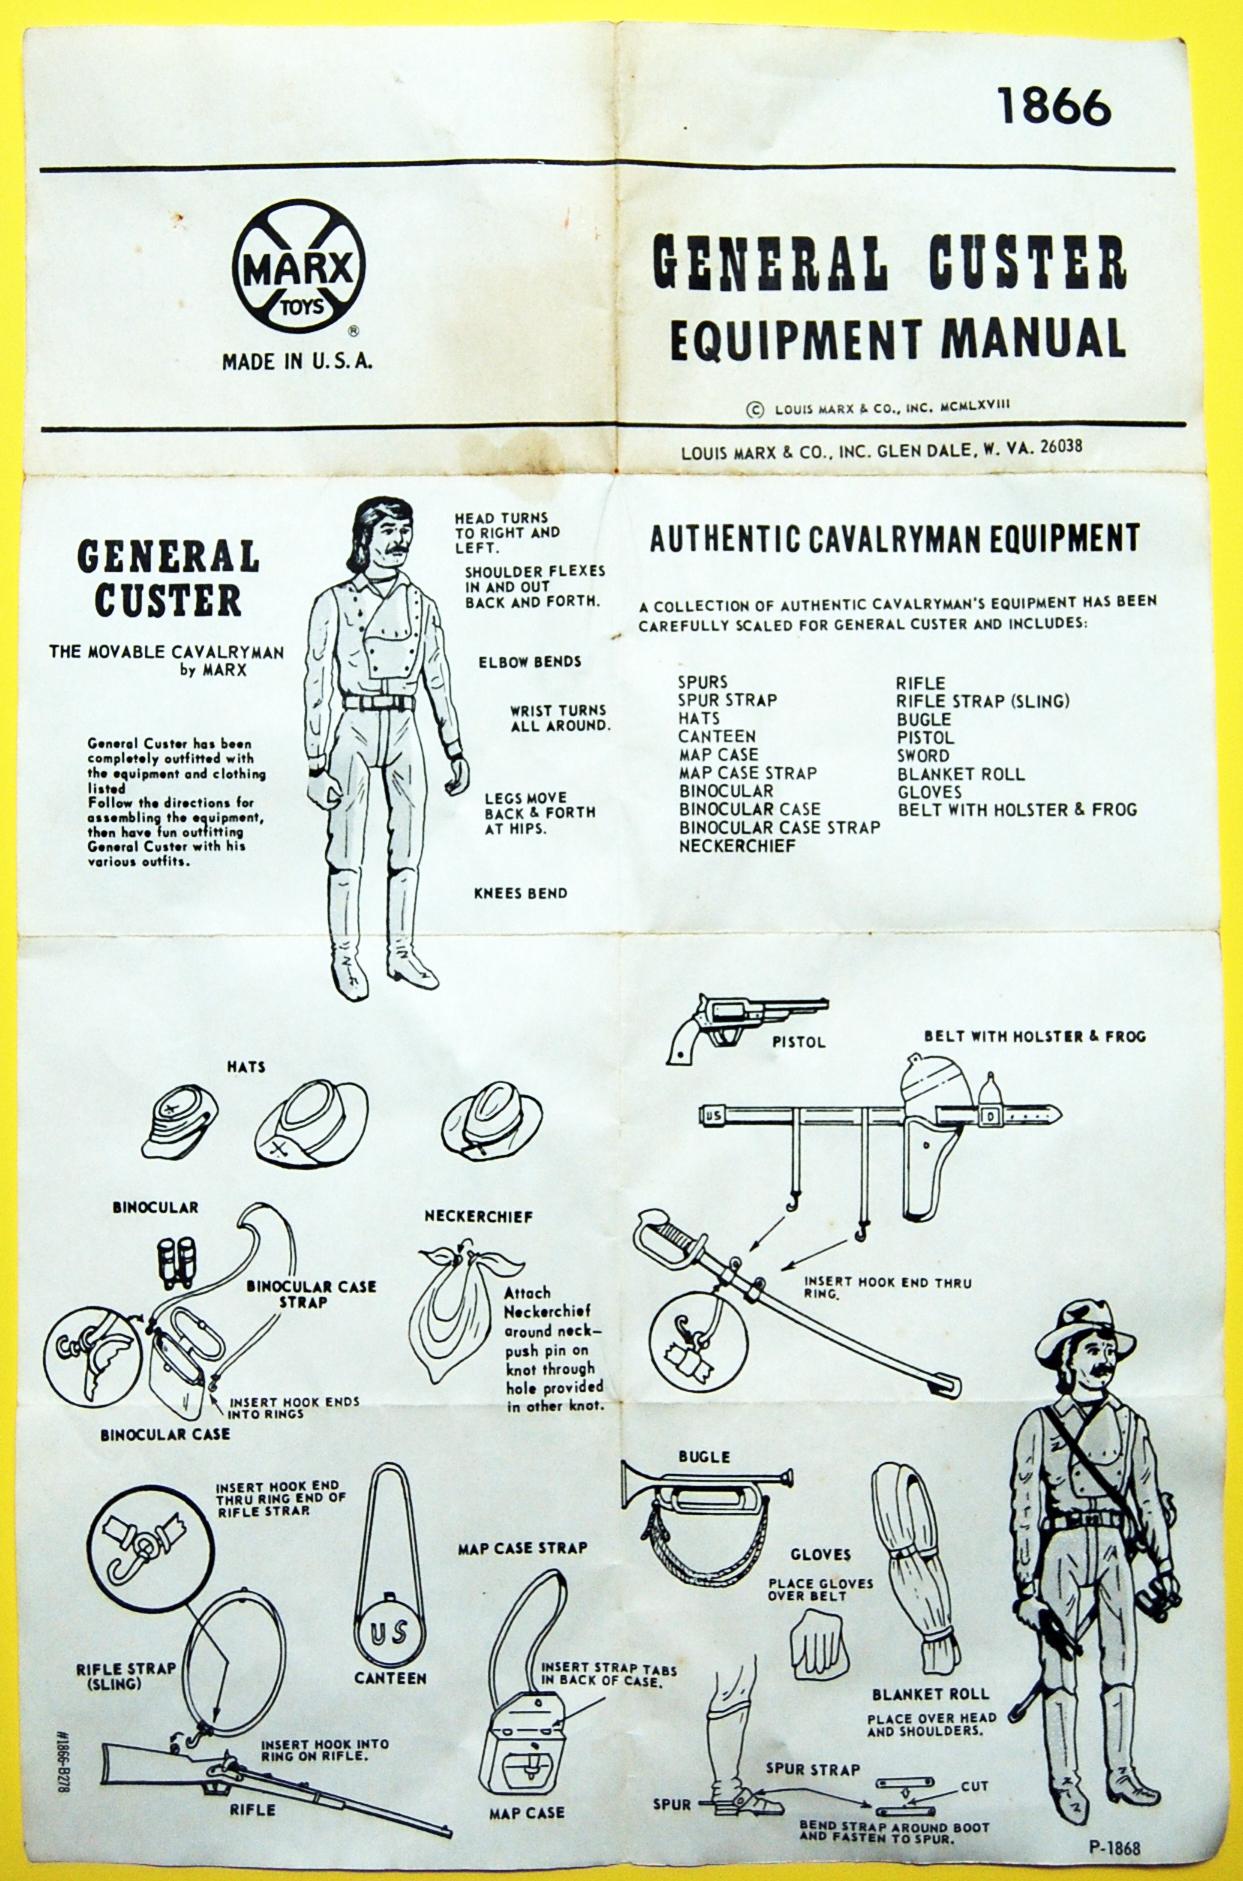 Stewart S Best Of The West Manual Display